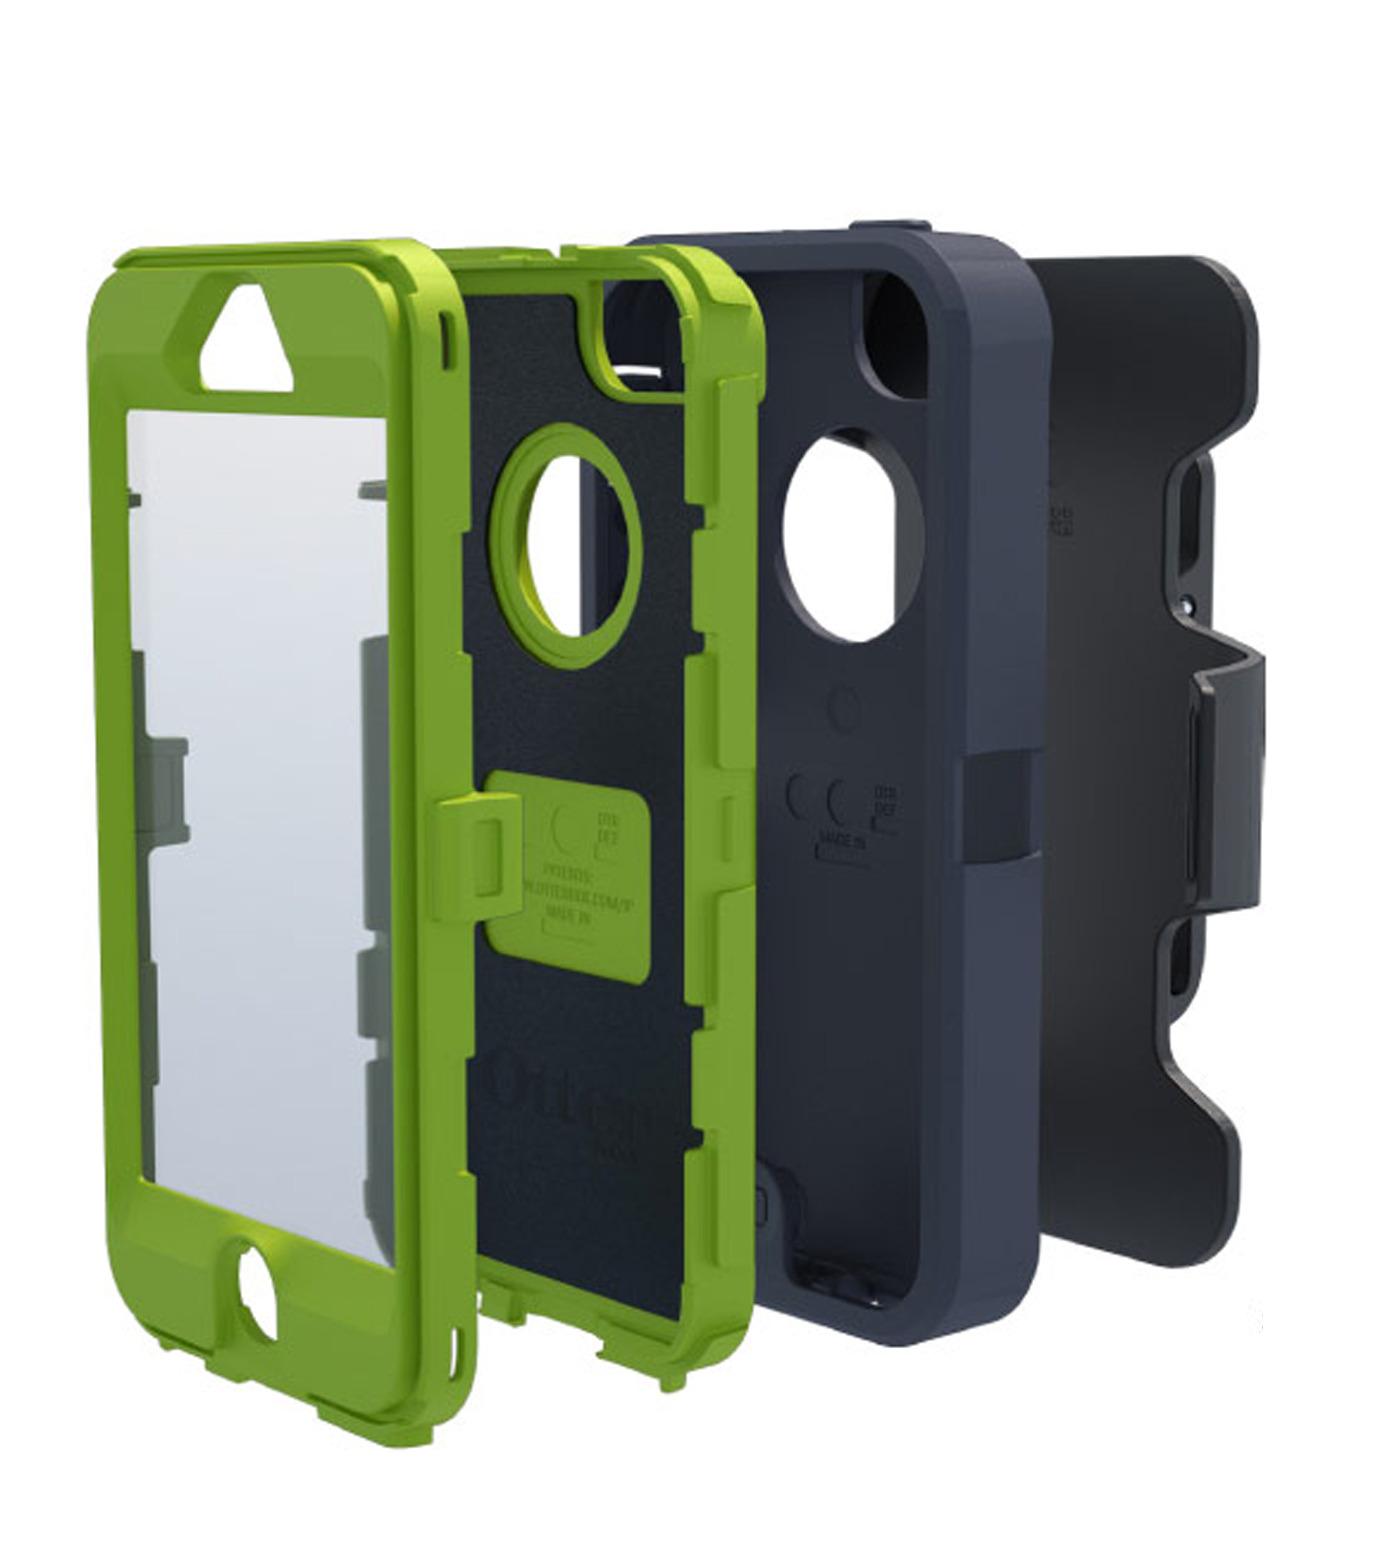 Tunewear(チューンウエア)のiPhone5 Case-GRAY-OTB-PH-013-11 拡大詳細画像4